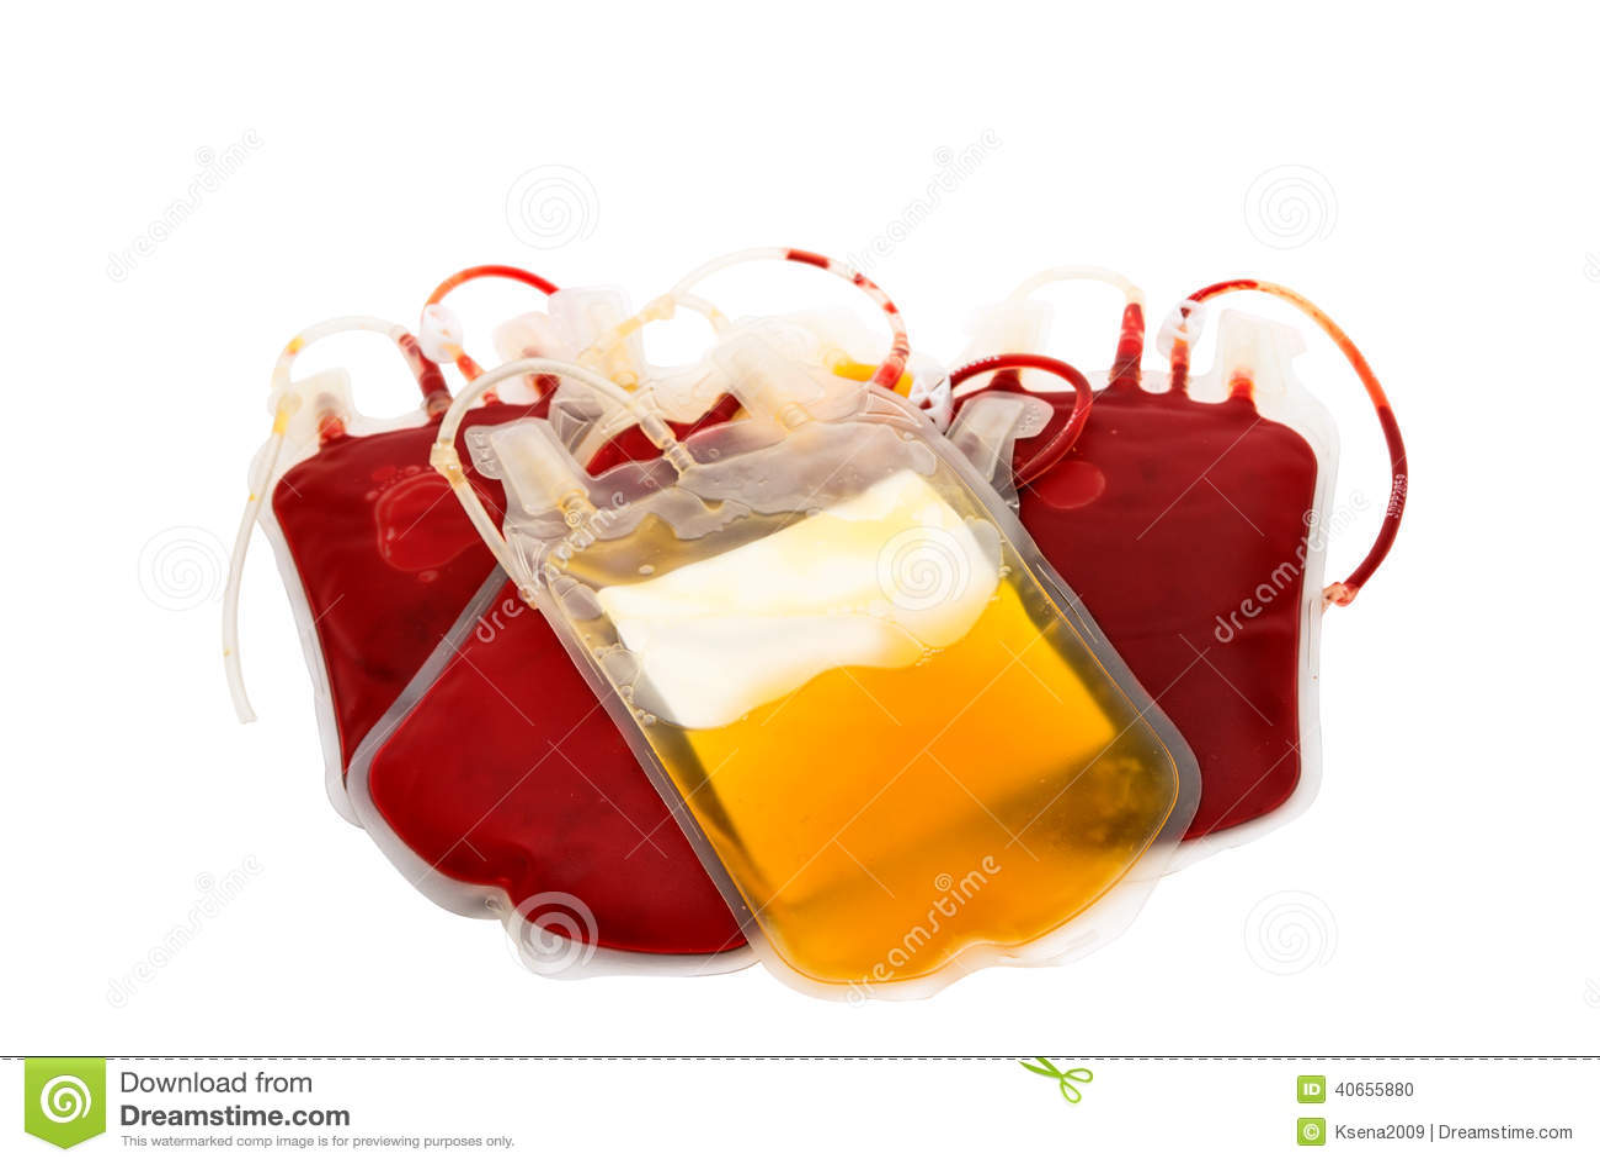 Bag of blood and plasma stock photo. Image of technology ...